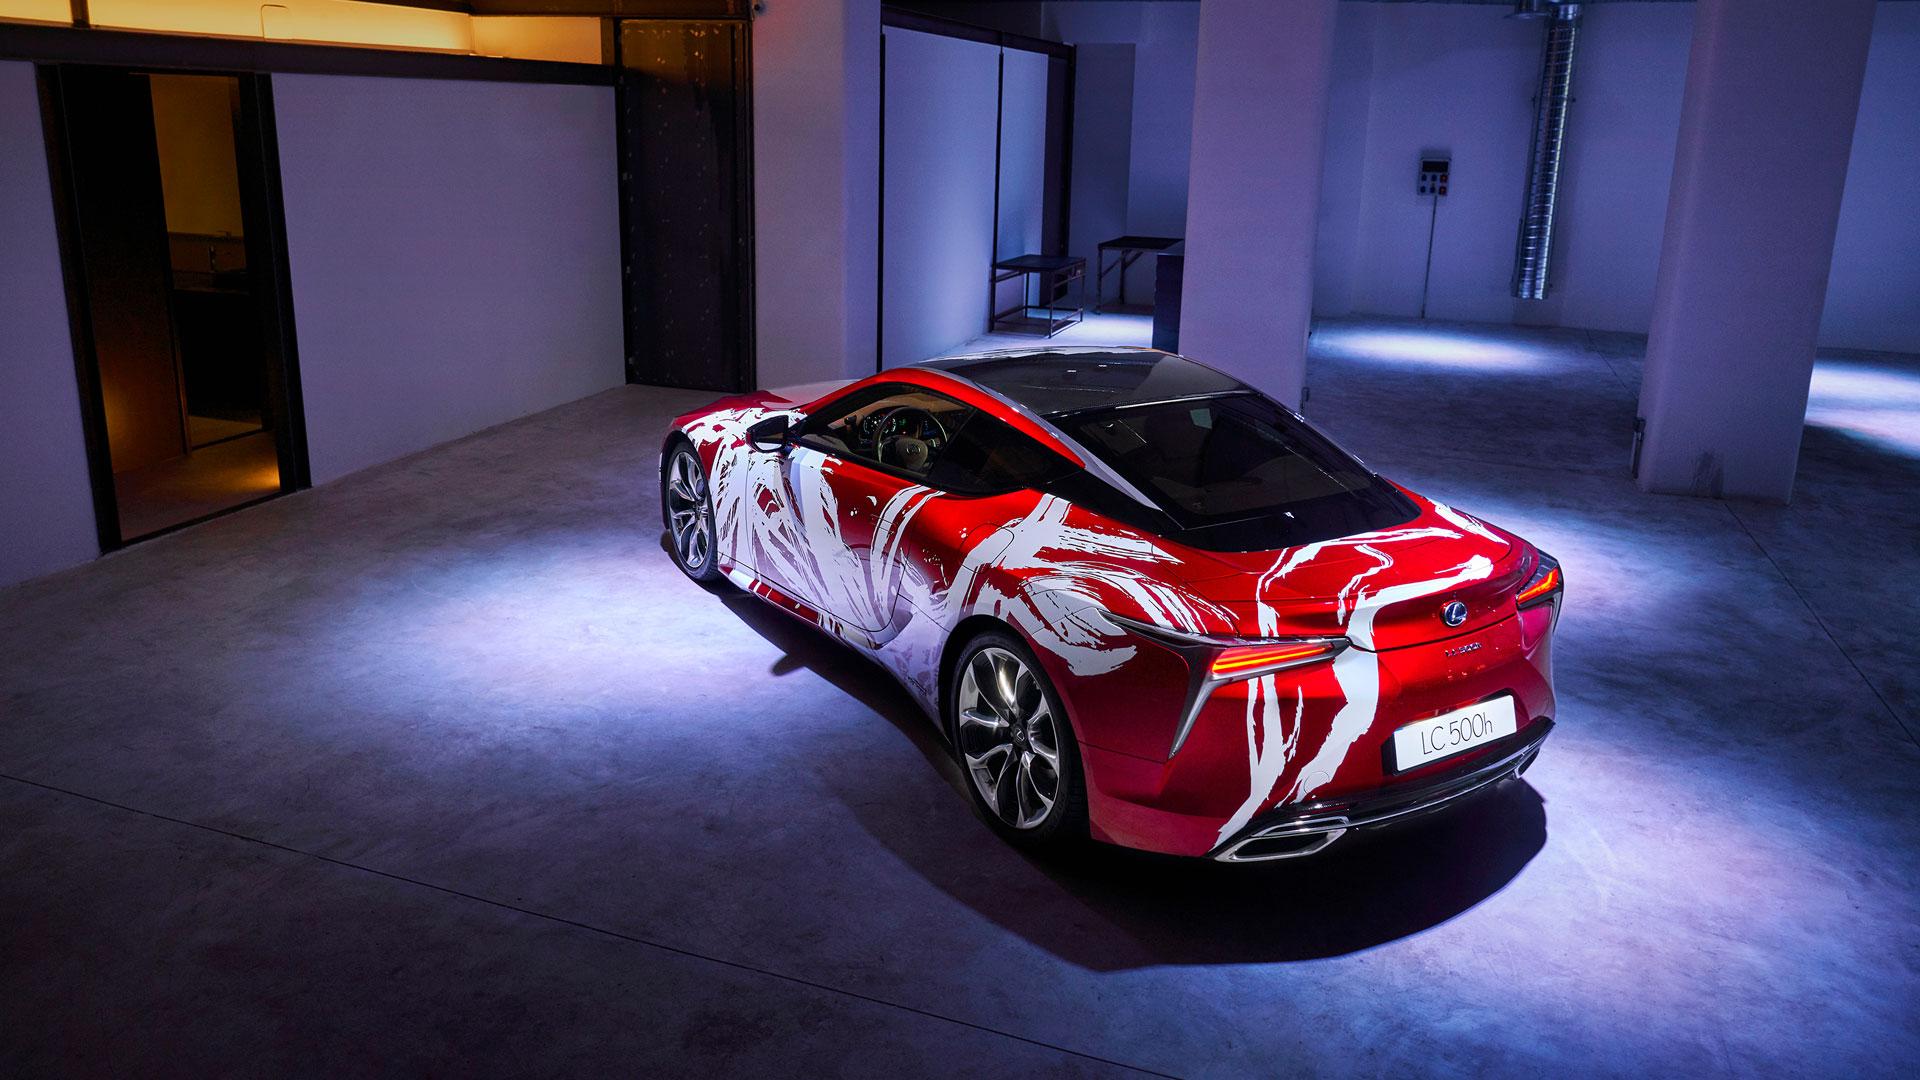 Imagen del diseño ganador del Art Car LC 500h